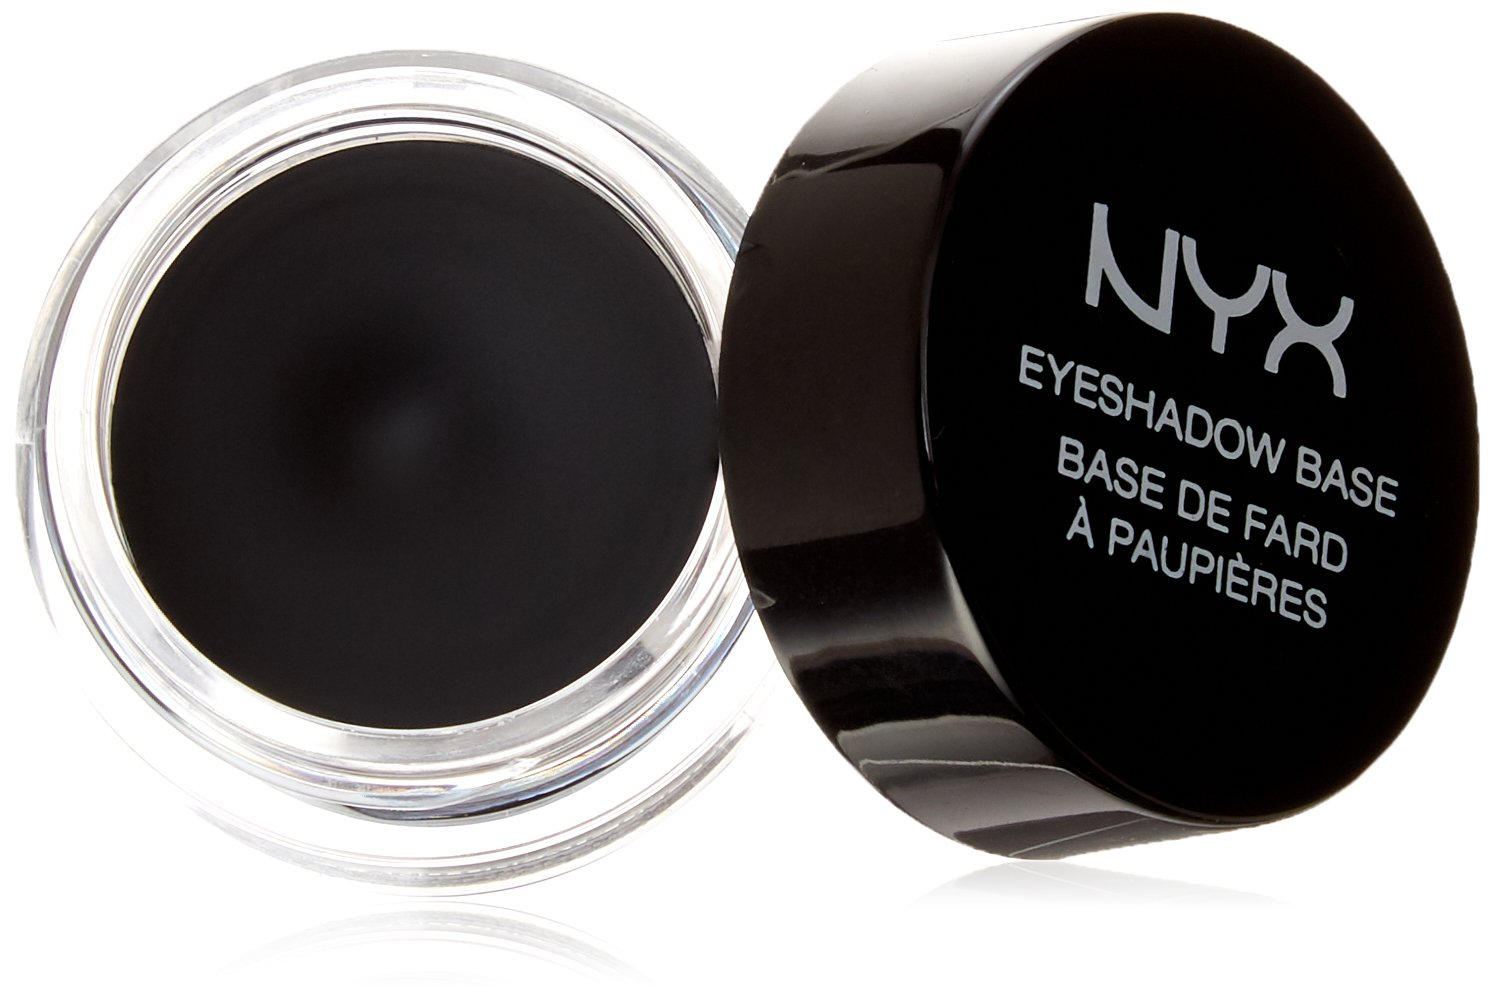 NYX PROFESSIONAL MAKEUP Eyeshadow Base Primer, Black